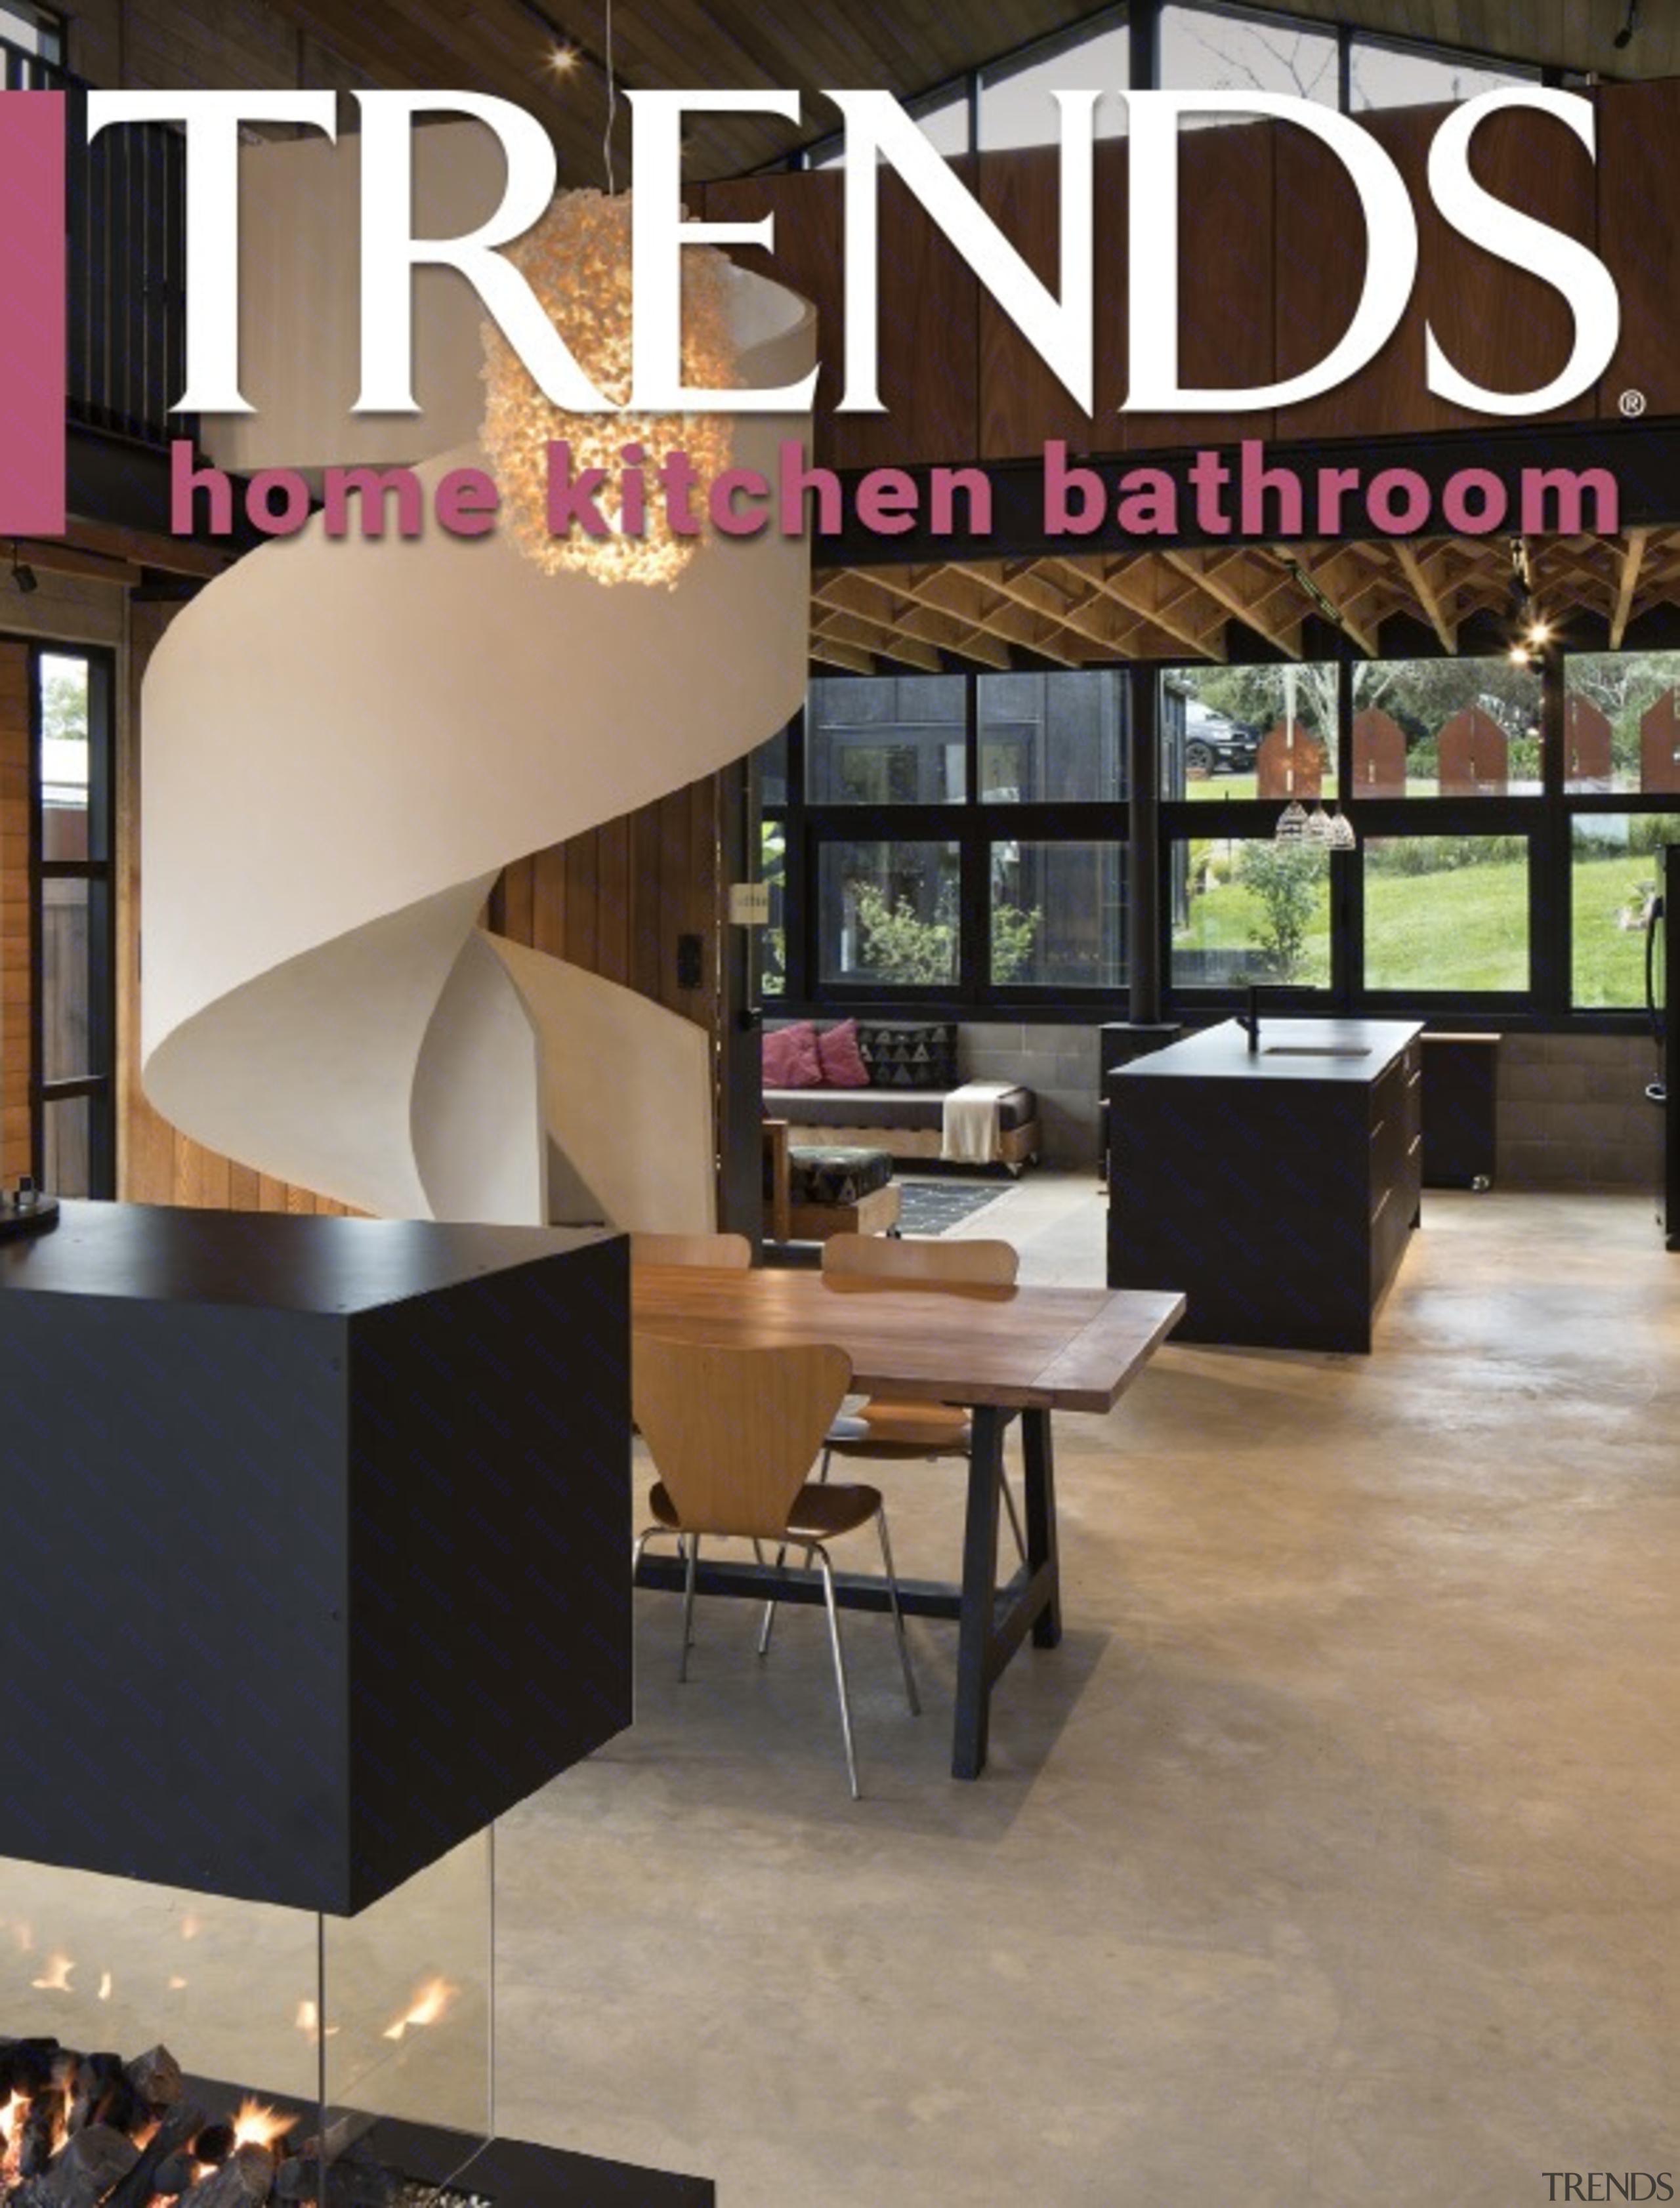 Nz3307 Minicover floor, flooring, furniture, interior design, product design, table, black, gray